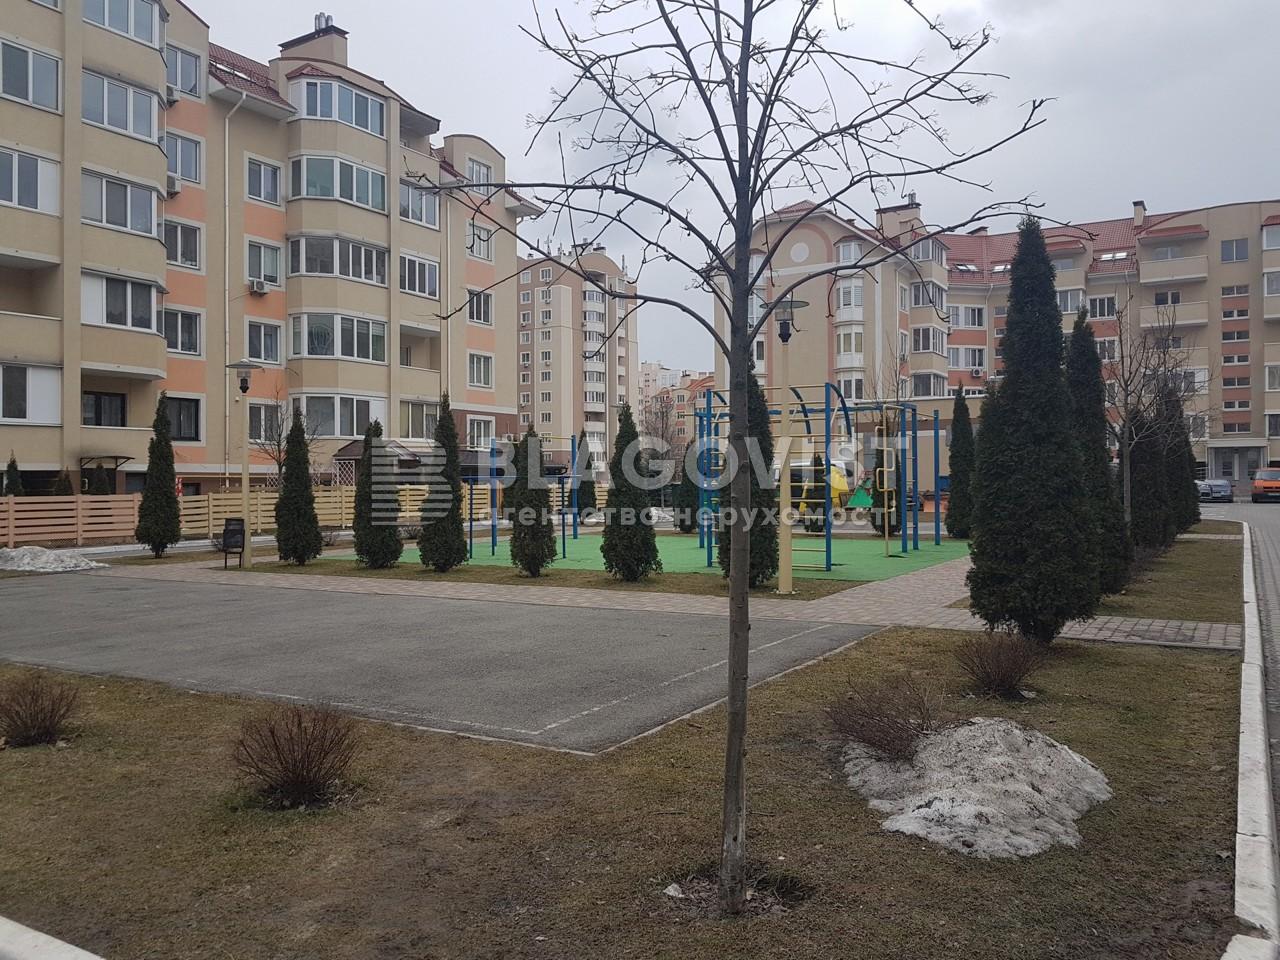 Квартира E-40784, Леси Украинки, 4, Софиевская Борщаговка - Фото 49